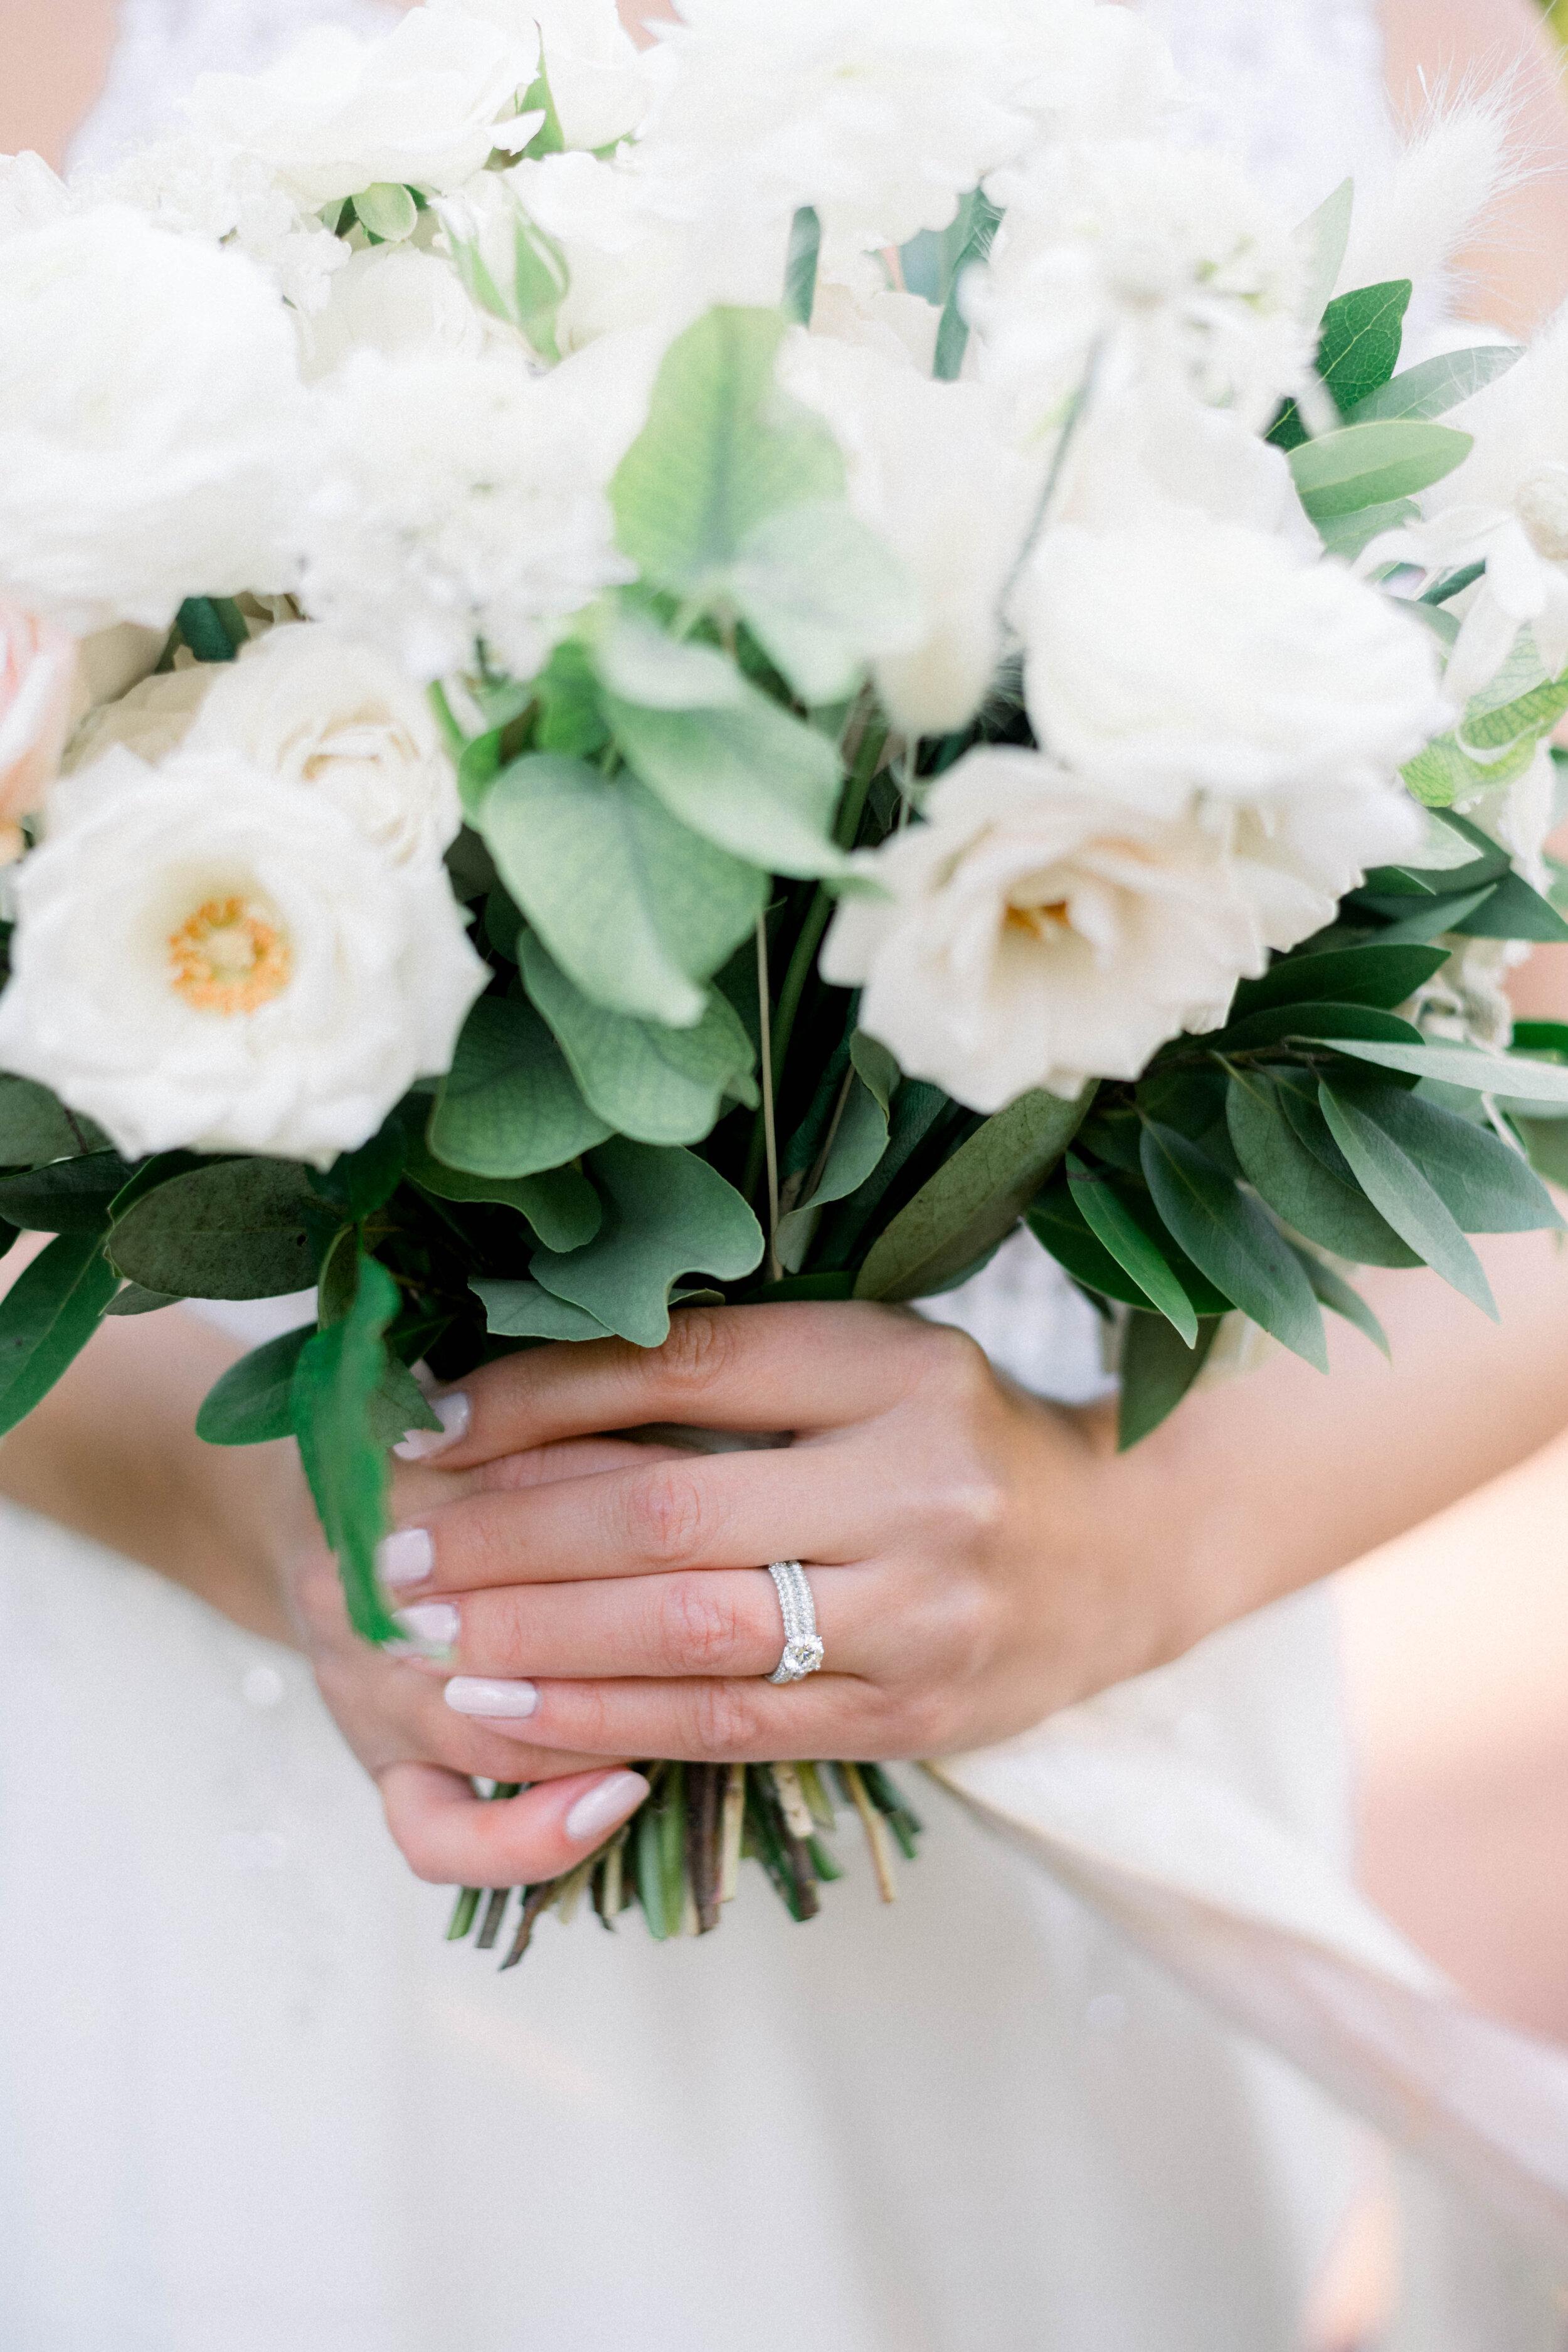 Fine Art Bride Editorial at Princeton University with Hamilton Jewelers and Cassandra Shah Flowers